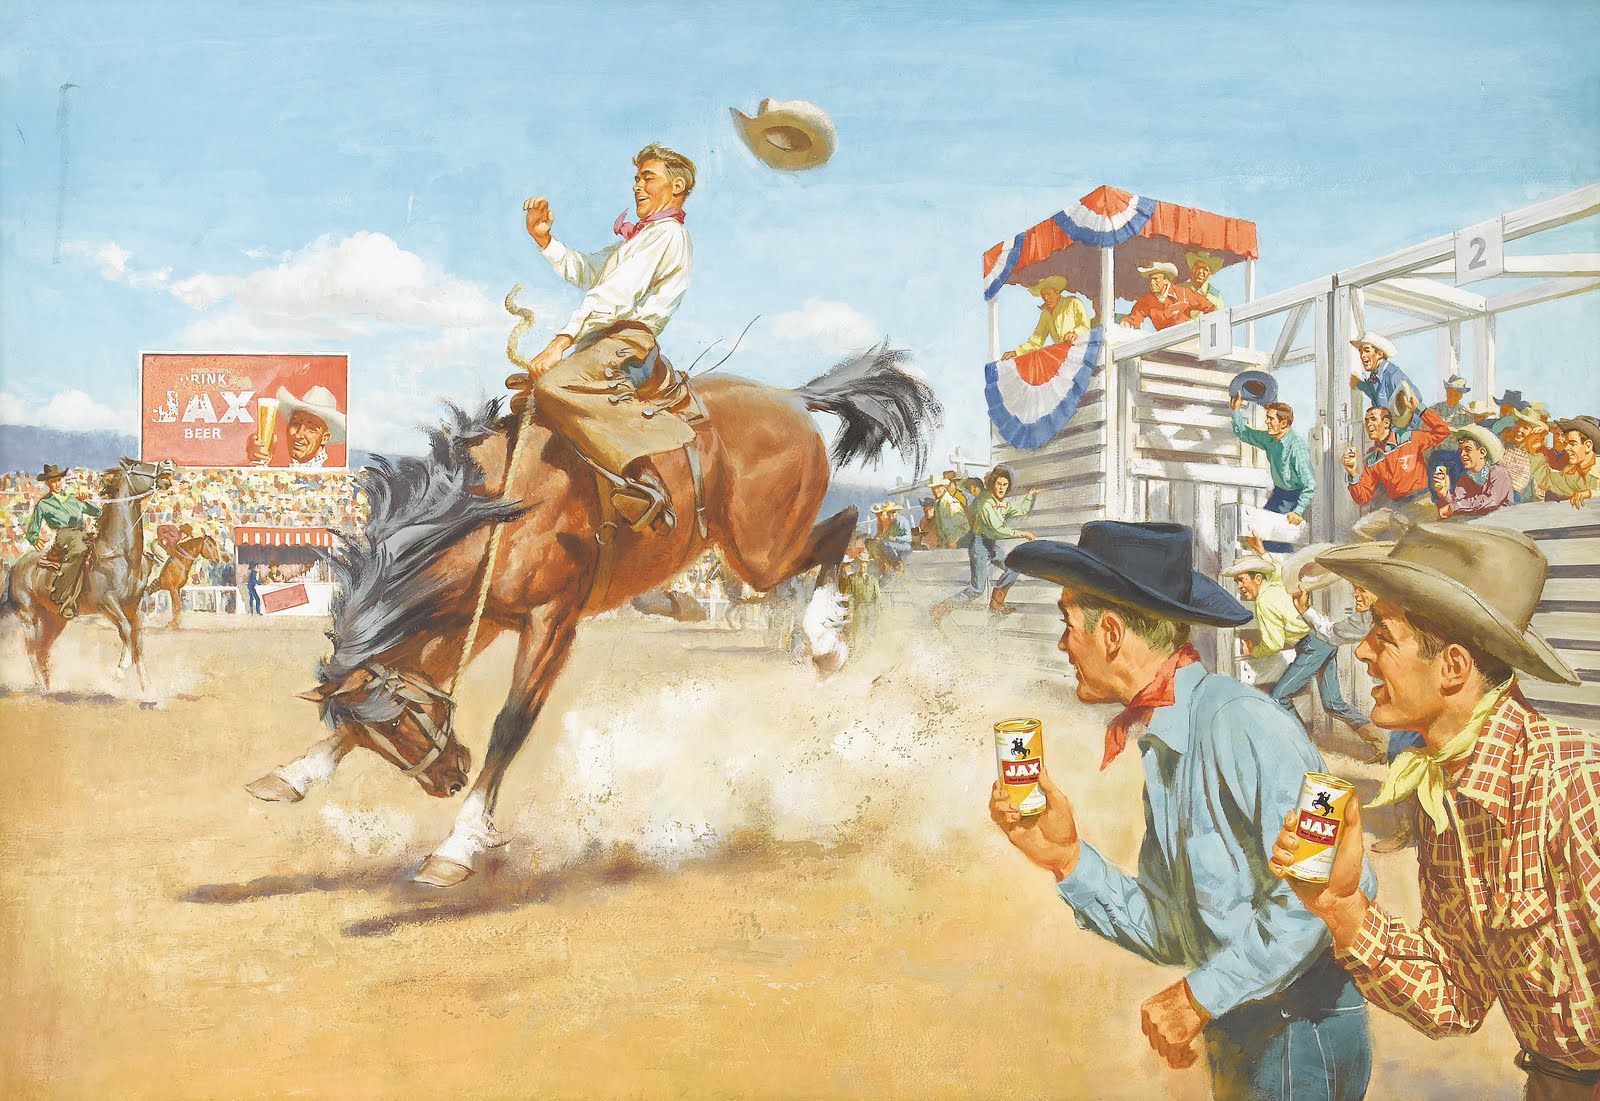 http://1.bp.blogspot.com/_5gznc9_9DxE/S69IsLwXgZI/AAAAAAAAG0s/5L8QcRB_MWo/s1600/FRANK+C.+MCCARTHY+(American+1924-2002)+.+Bronc+Riding,+c.1960.jpg